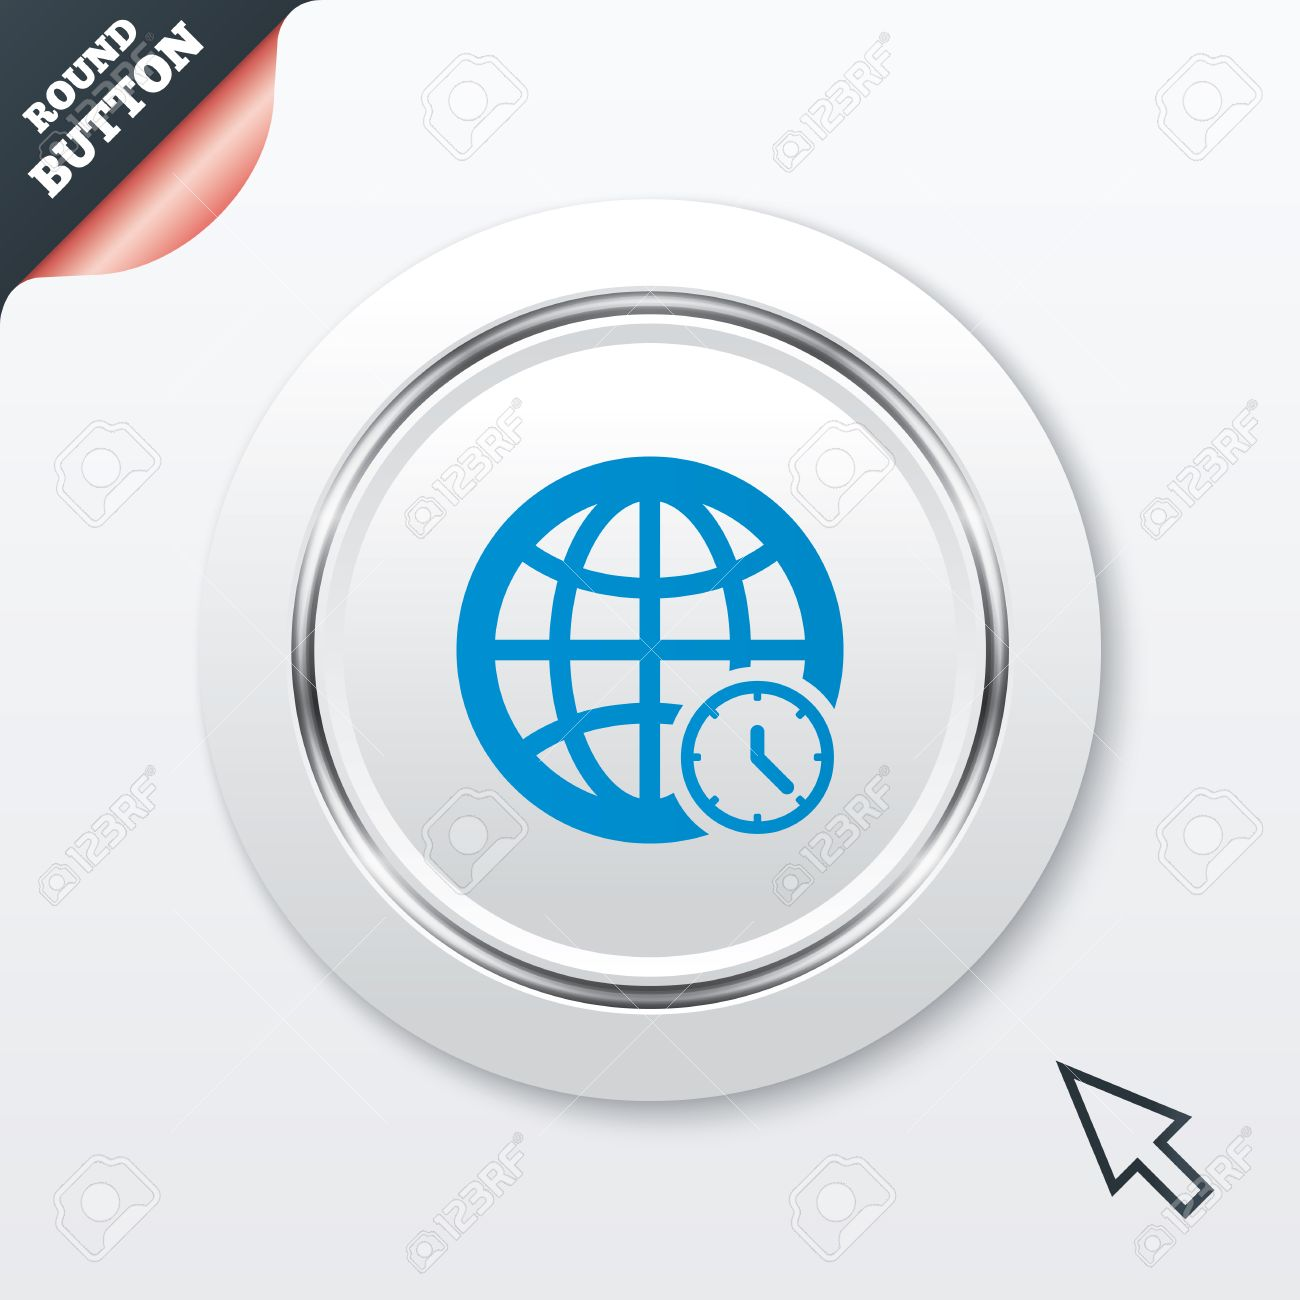 World Time Sign Icon. Universal Time Globe Symbol. Royalty Free.